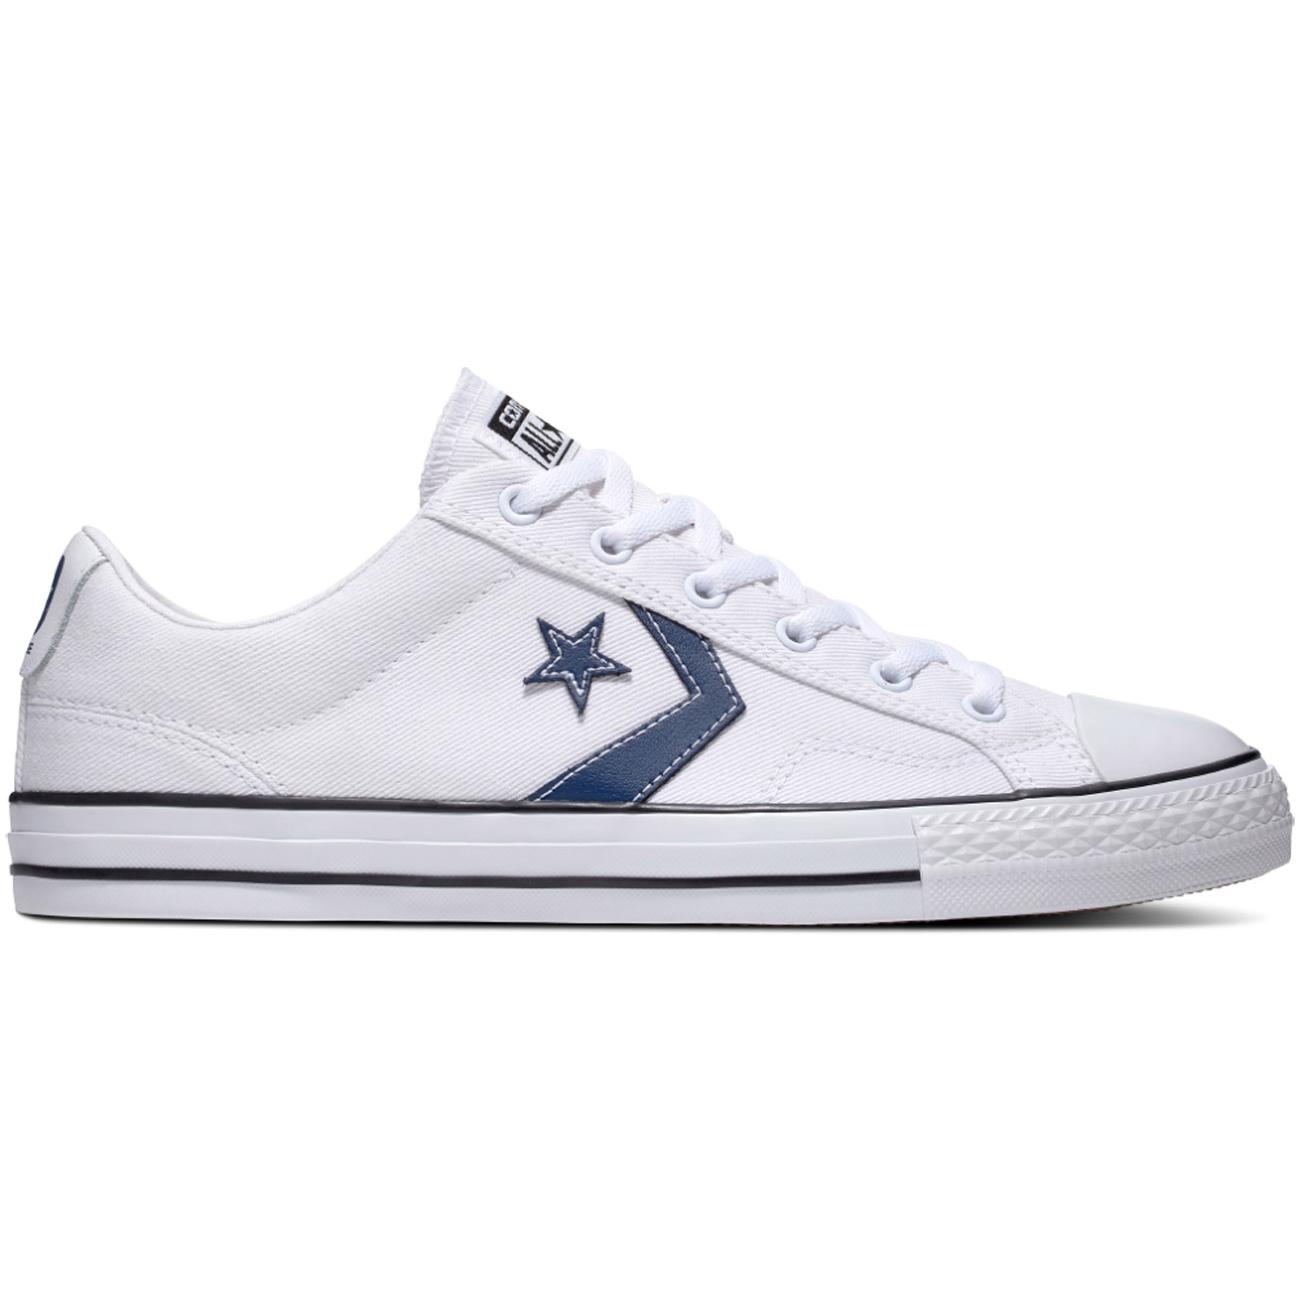 298e3c3e280b19 Converse Herren Sneaker STAR PLAYER OX